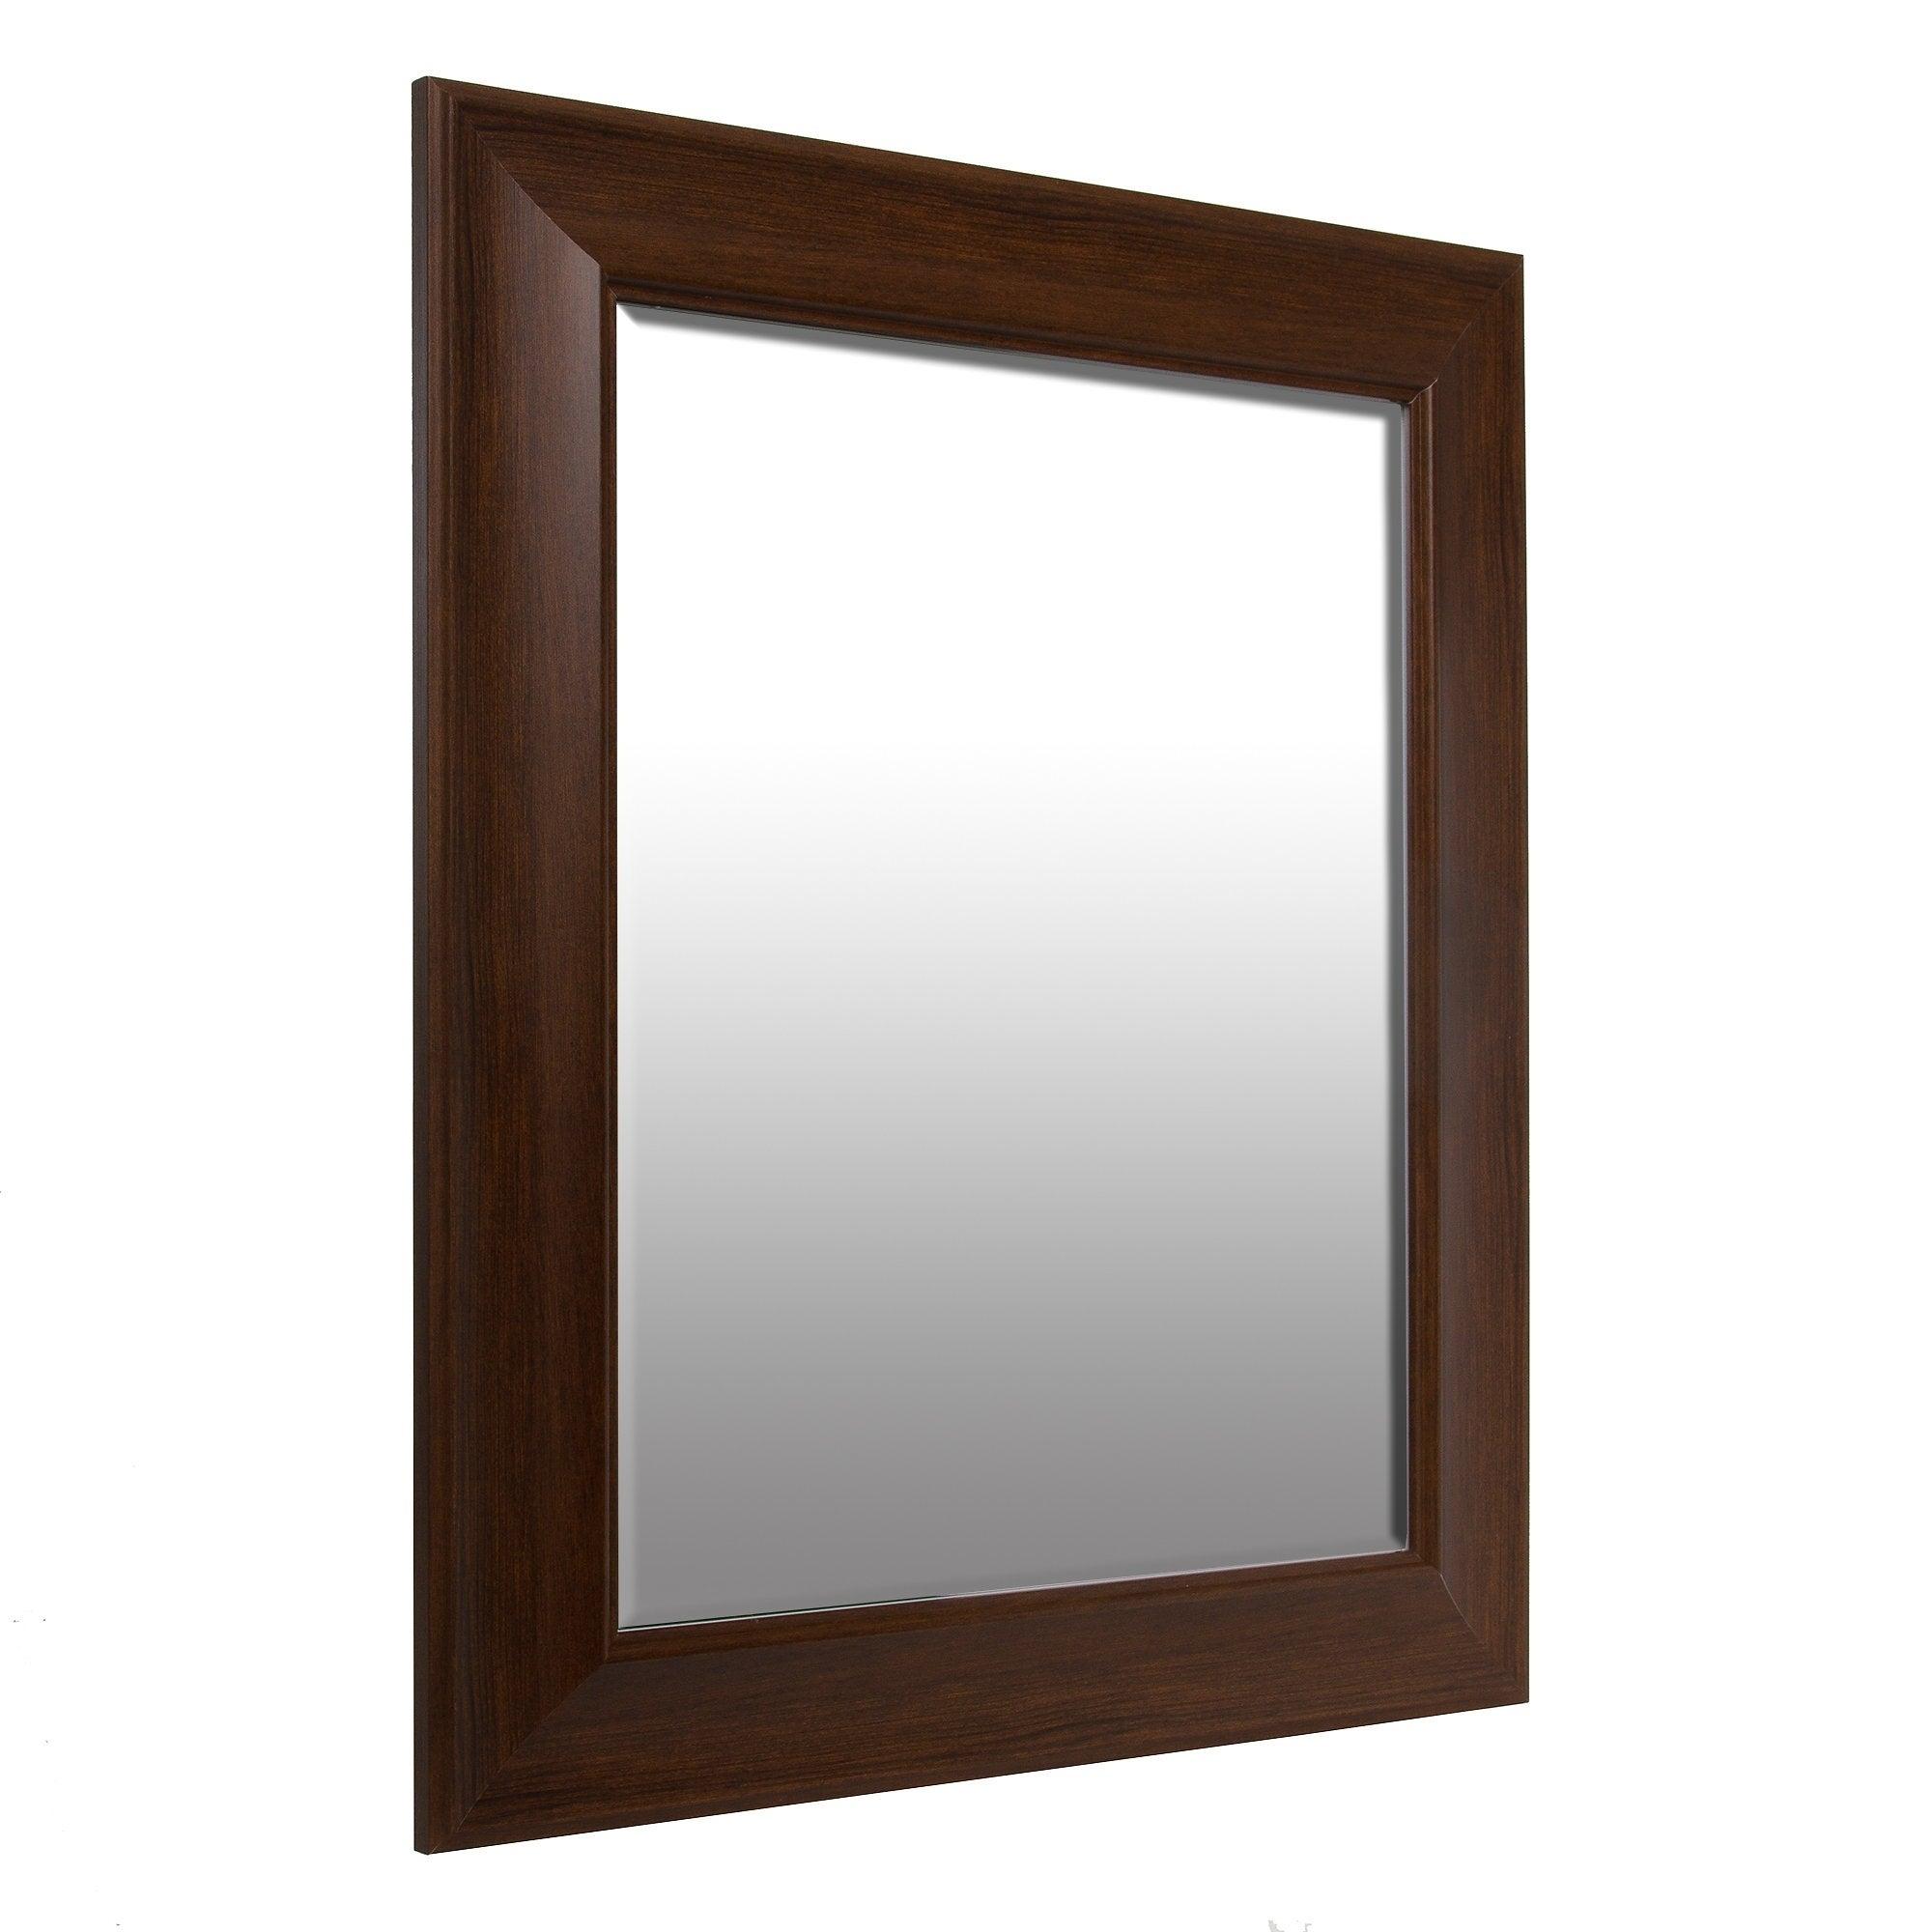 16X20 Traditional Beveled Wall Mirror Regarding Traditional Beveled Accent Mirrors (Gallery 18 of 30)